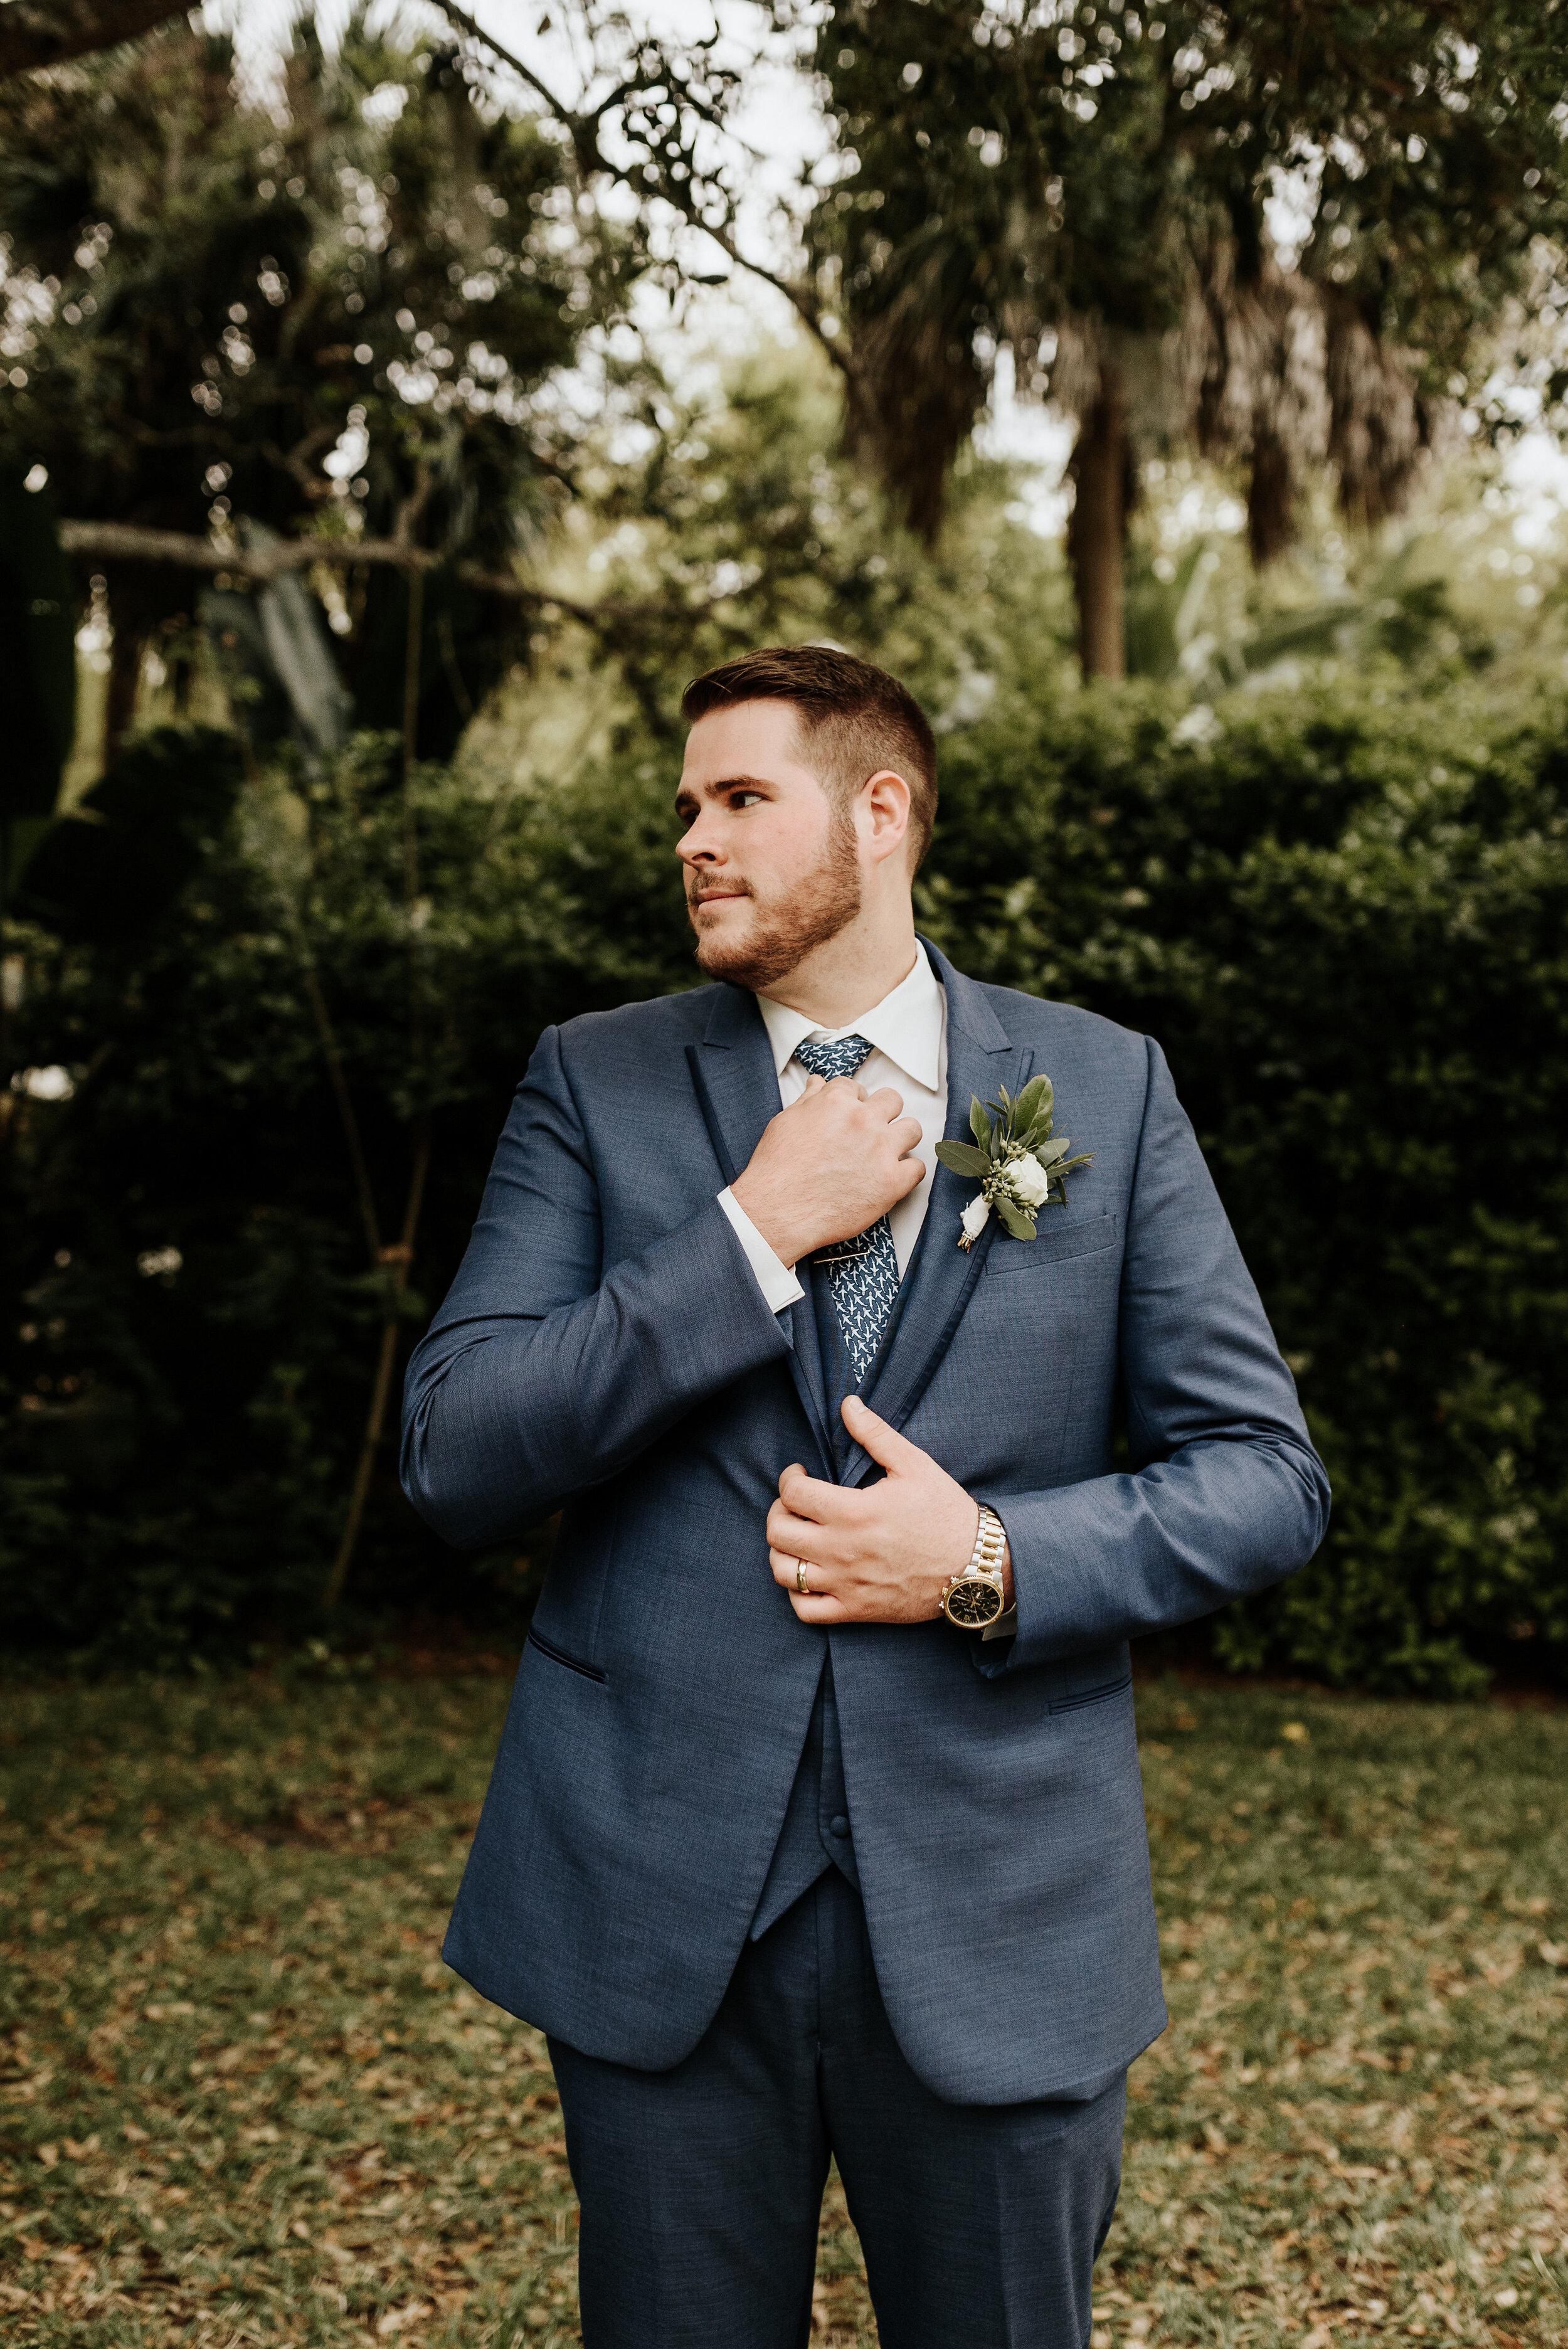 Mikenzi_Brad_Wedding_The_Delamater_House_New_Smyrna_Beach_Florida_Photography_by_V_0711.jpg